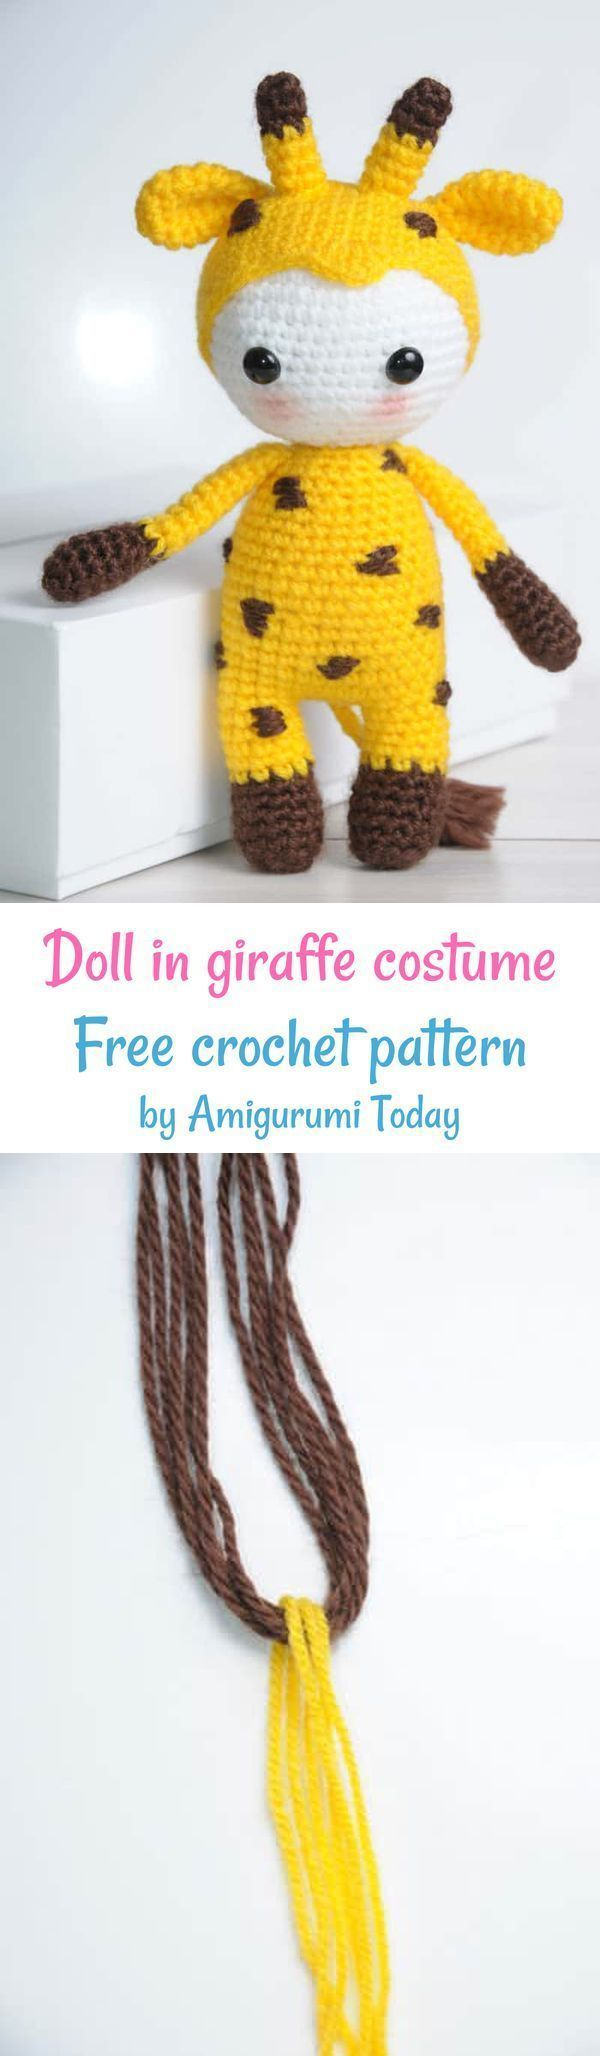 Tiny giraffe amigurumi pattern - Amigurumi Today   2056x600